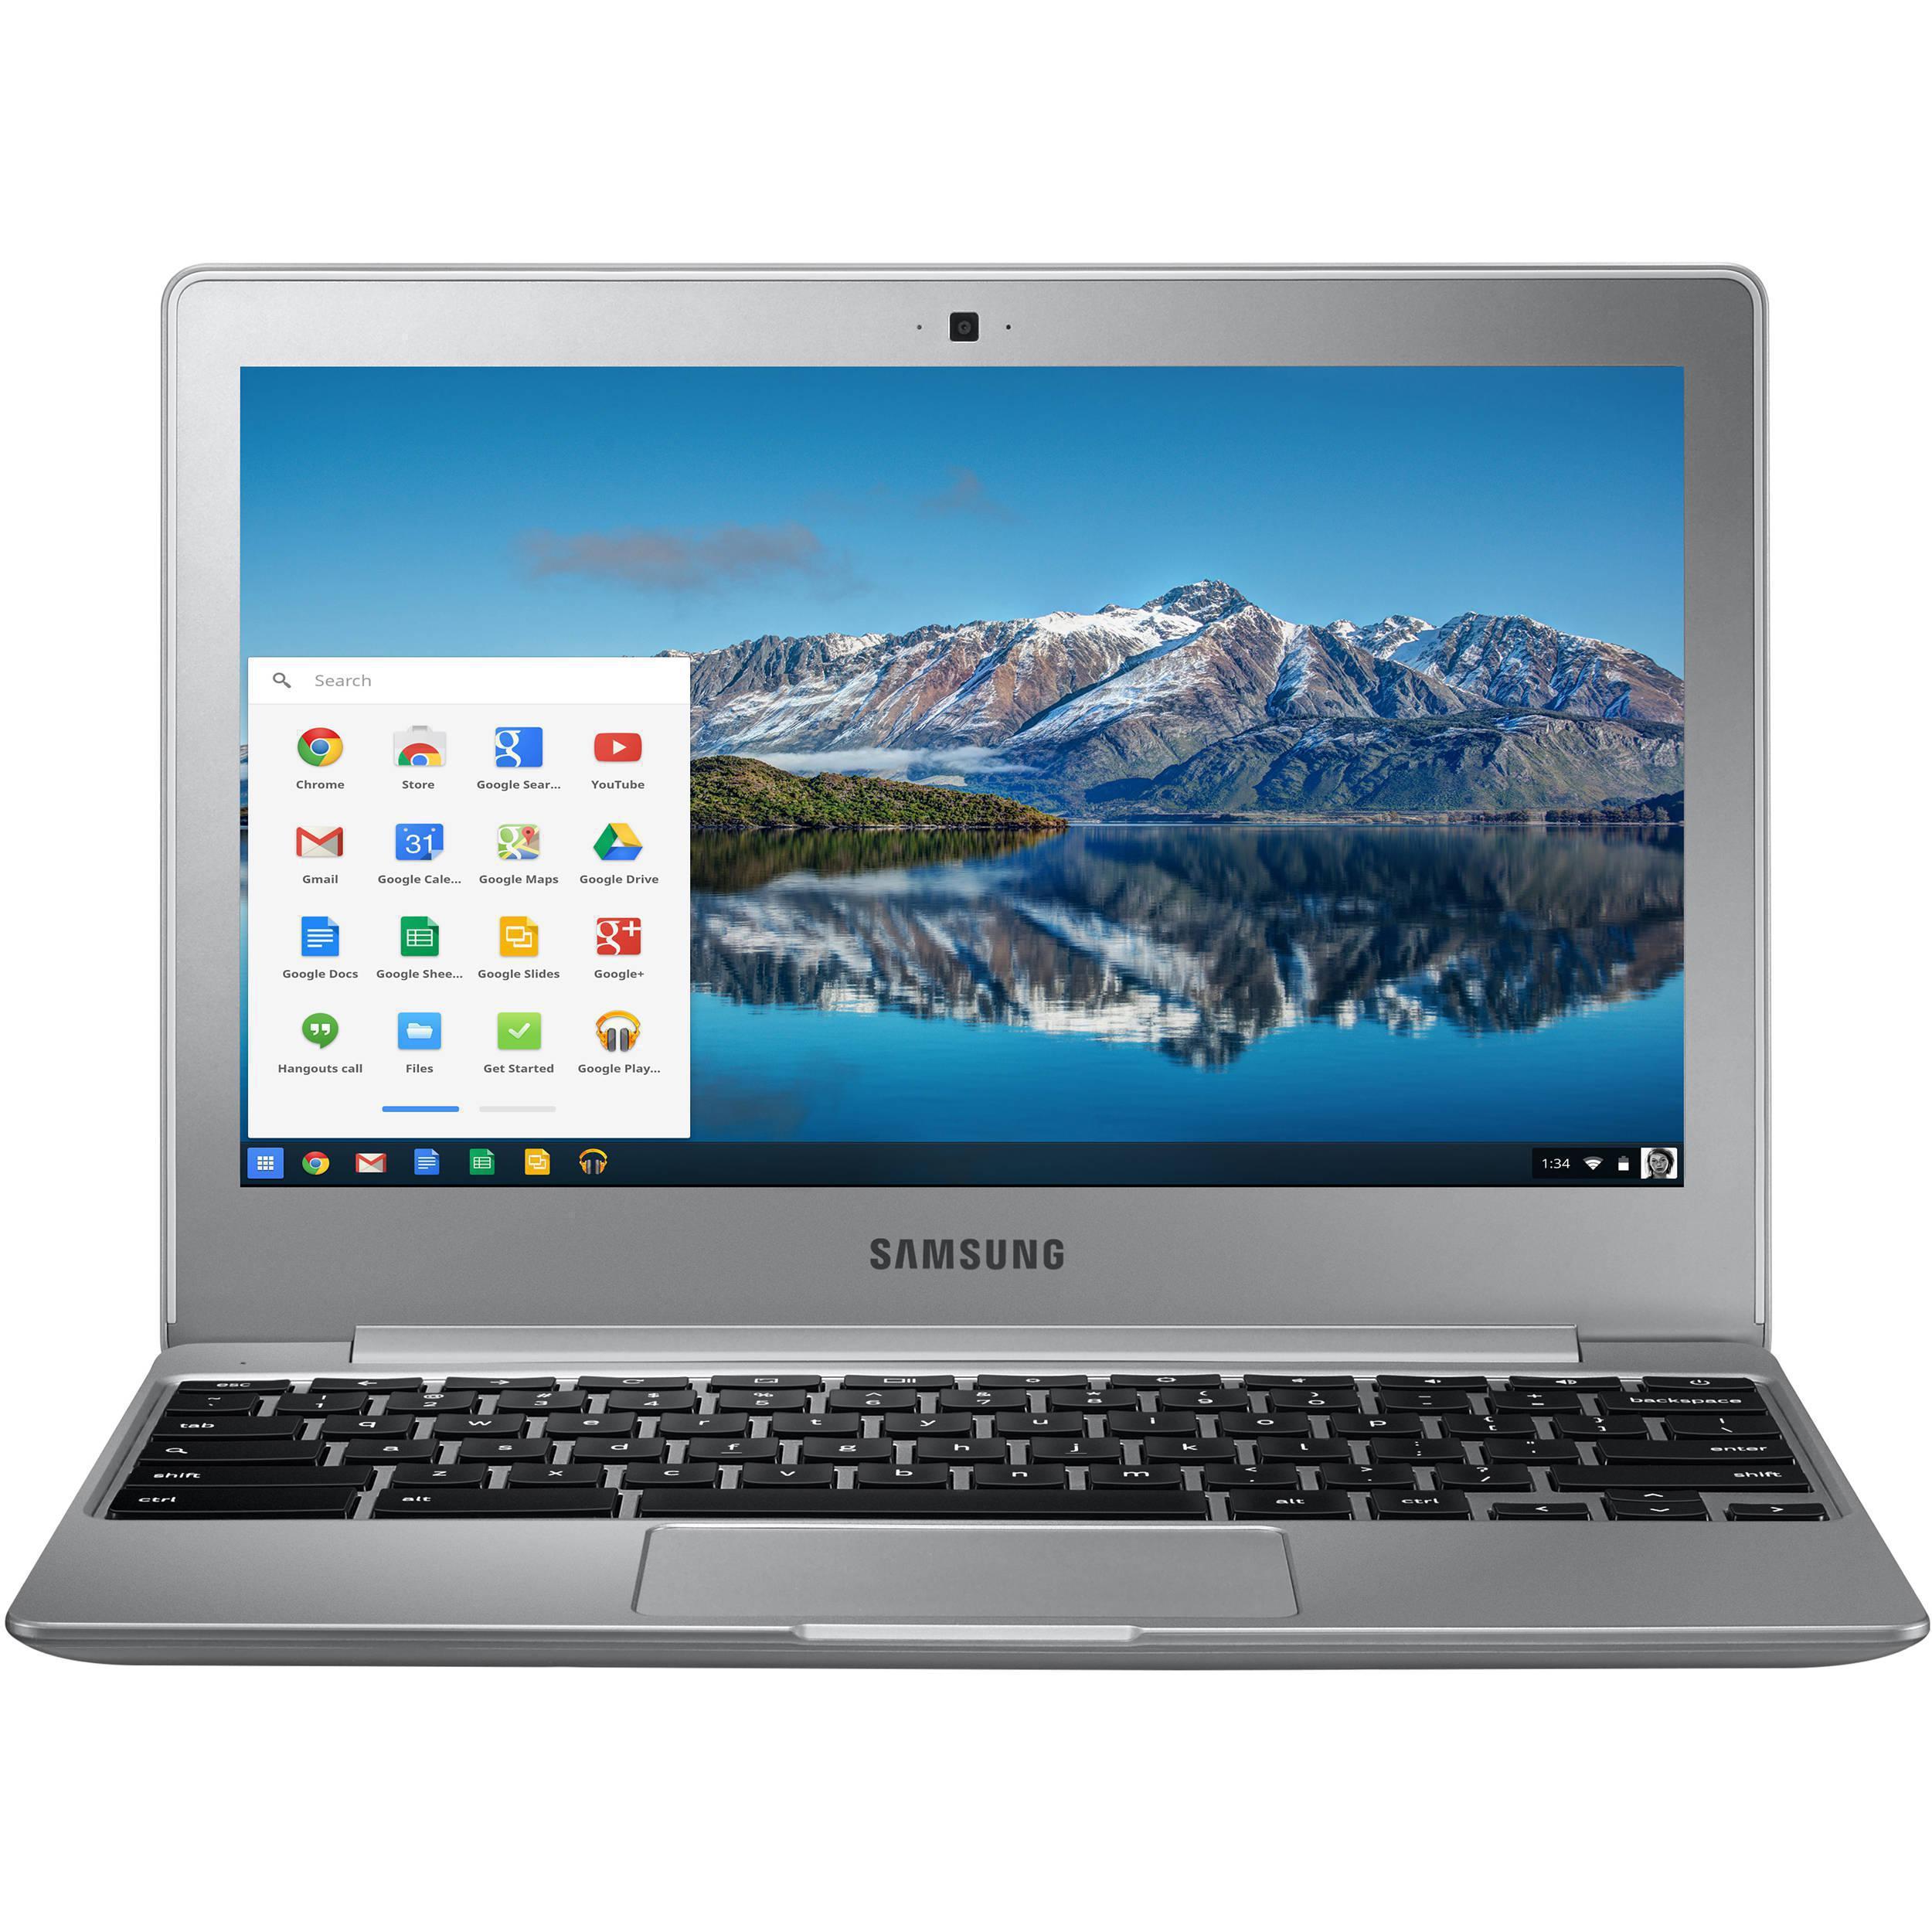 Samsung Chromebook 2 XE500C12-K01US Celeron N2840 2.167 GHz 16GB SSD - 2GB